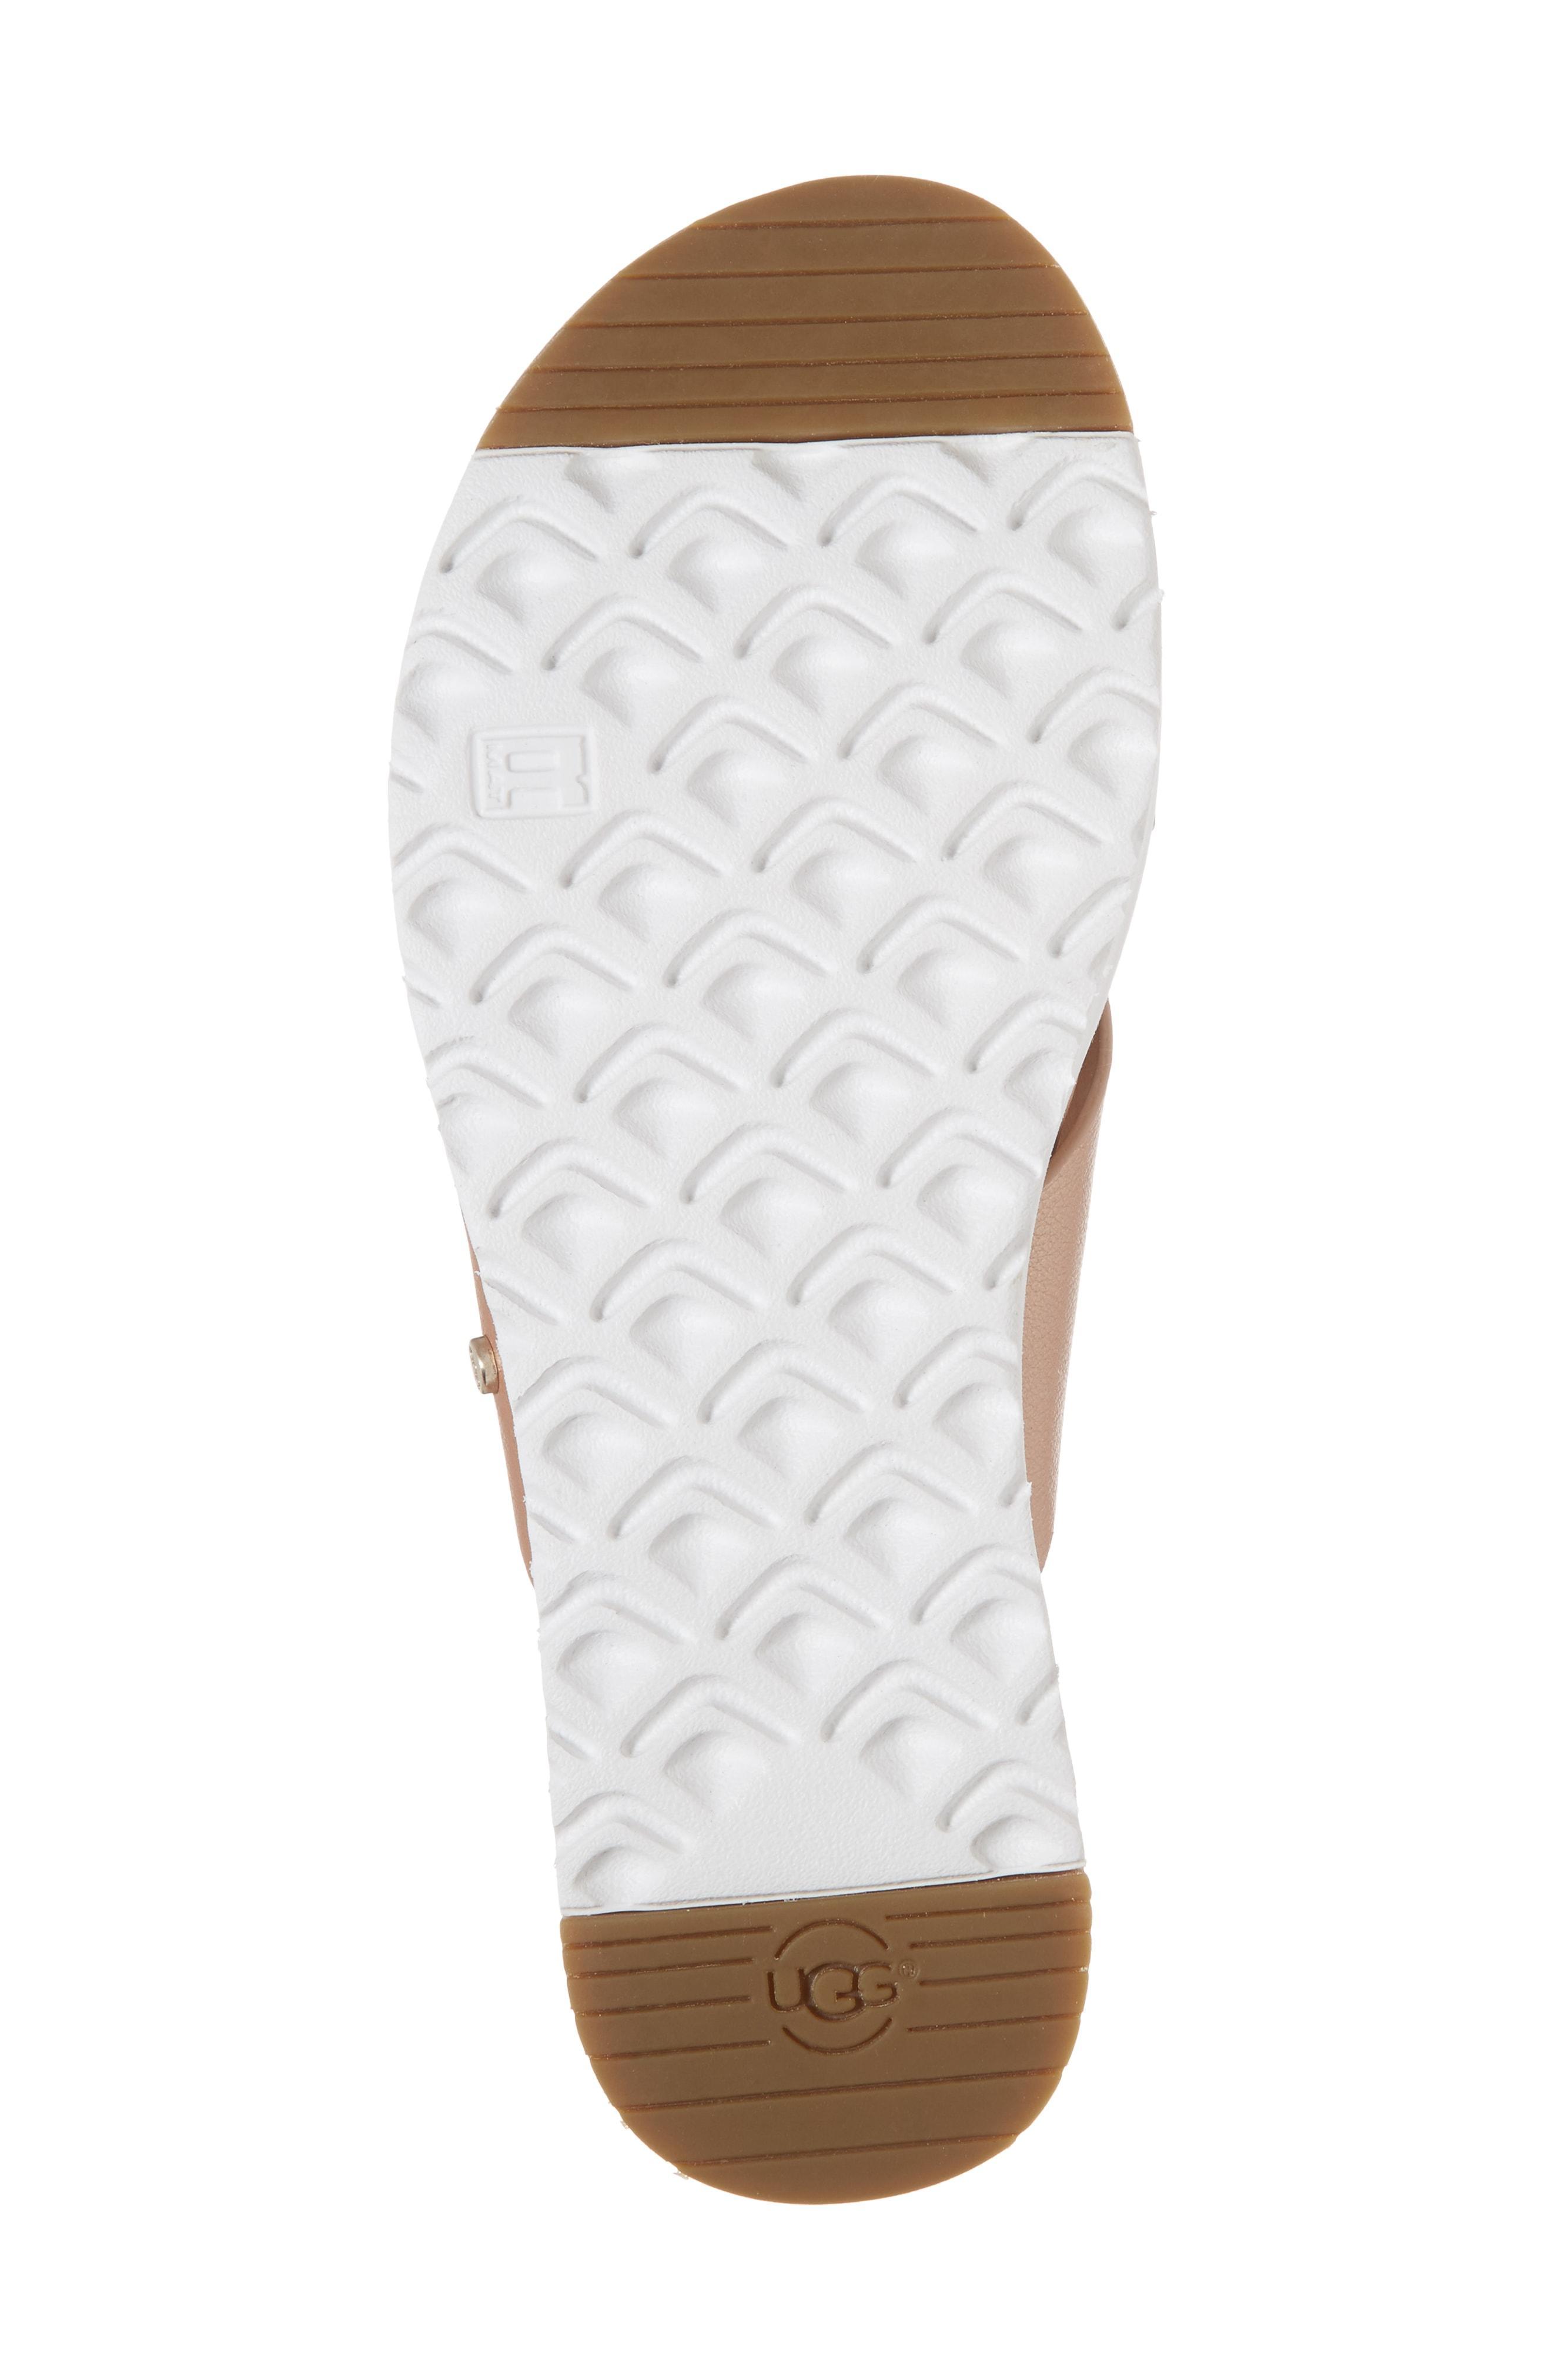 7f57db8c578 Kari Metallic Leather/Suede Cross-Band Slide Sandal in Rose Gold Leather